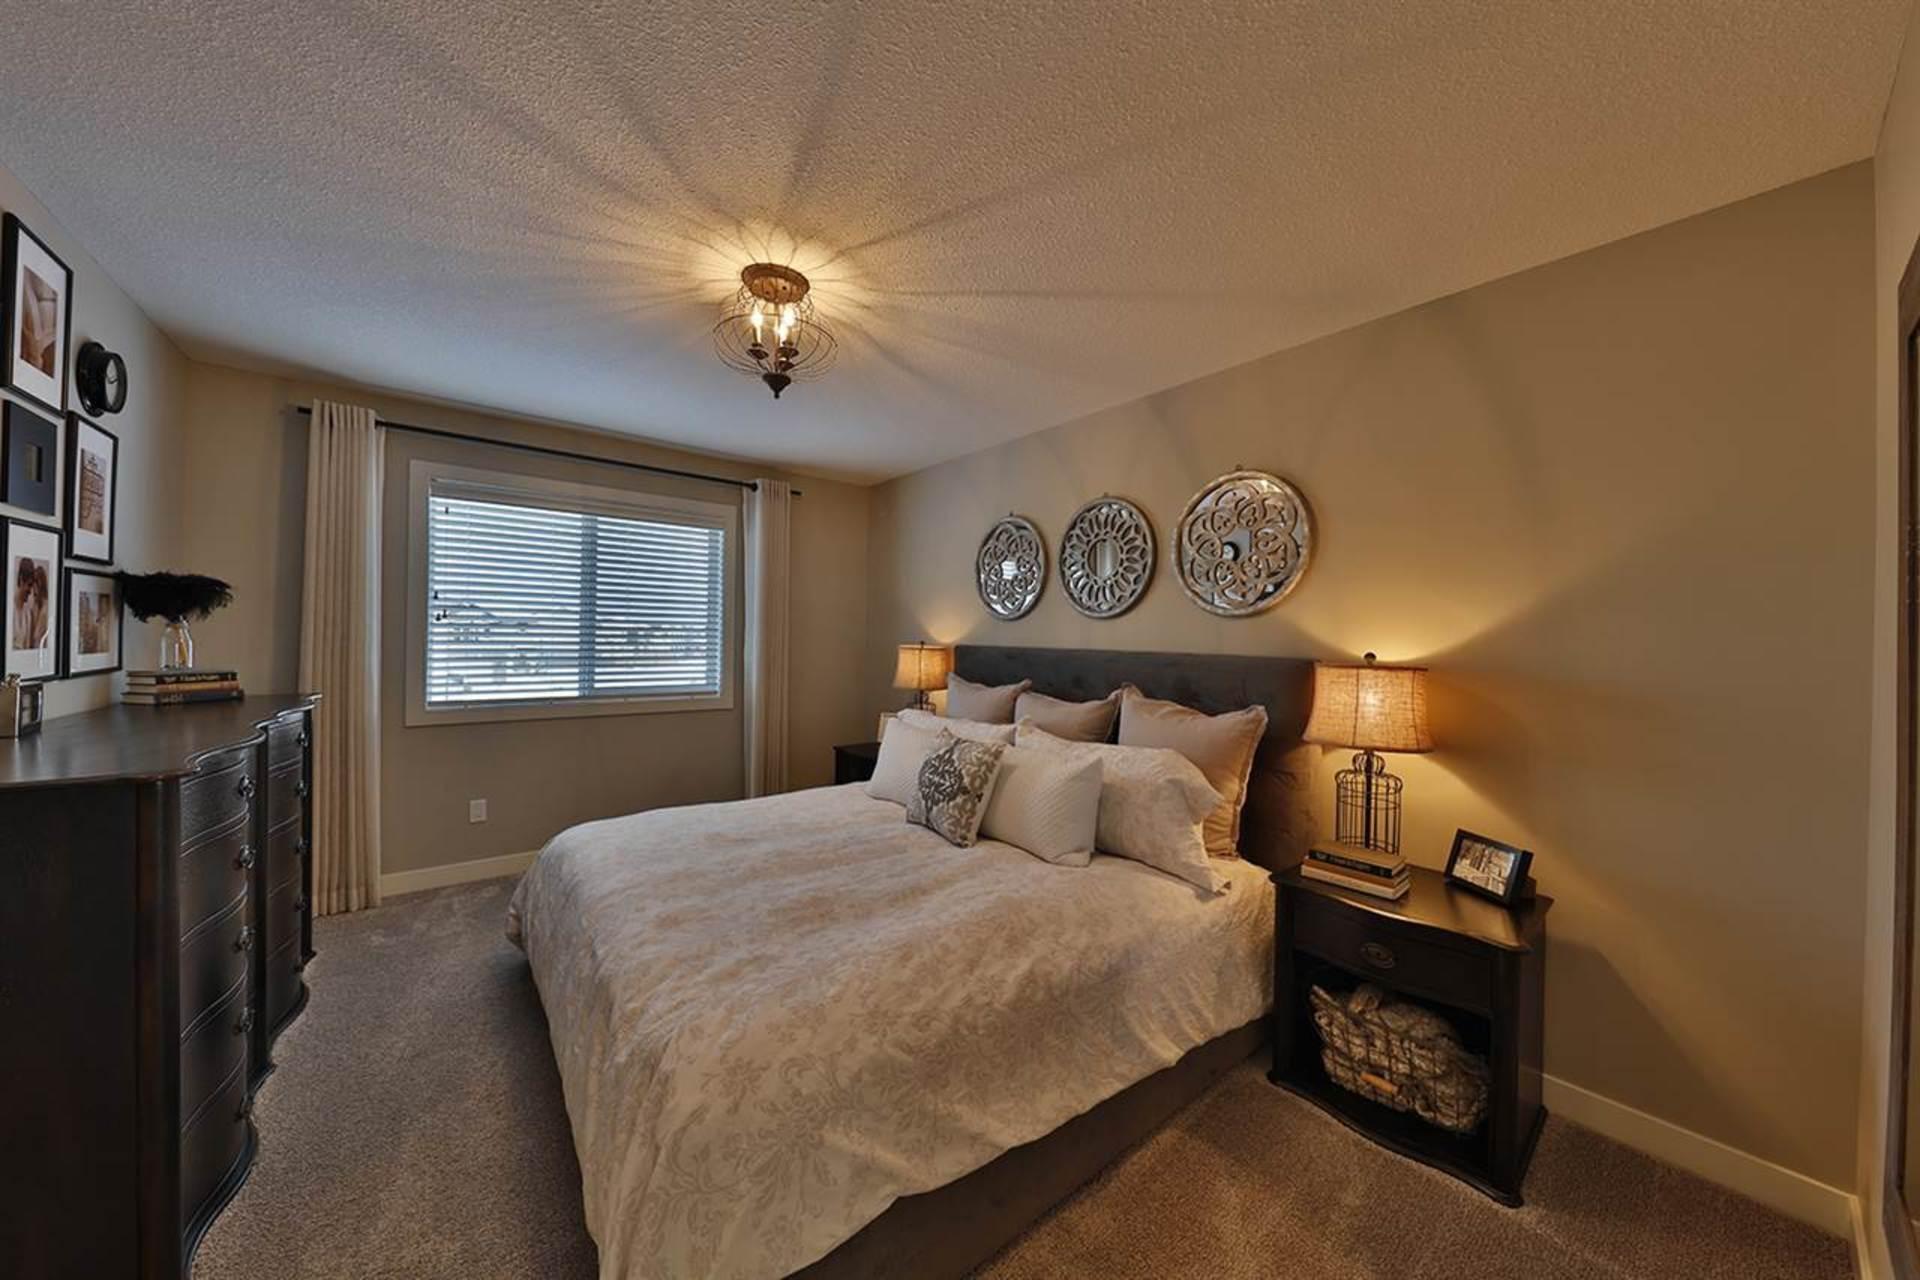 17839-61-street-mcconachie-area-edmonton-15 at 17839 61 Street, McConachie Area, Edmonton